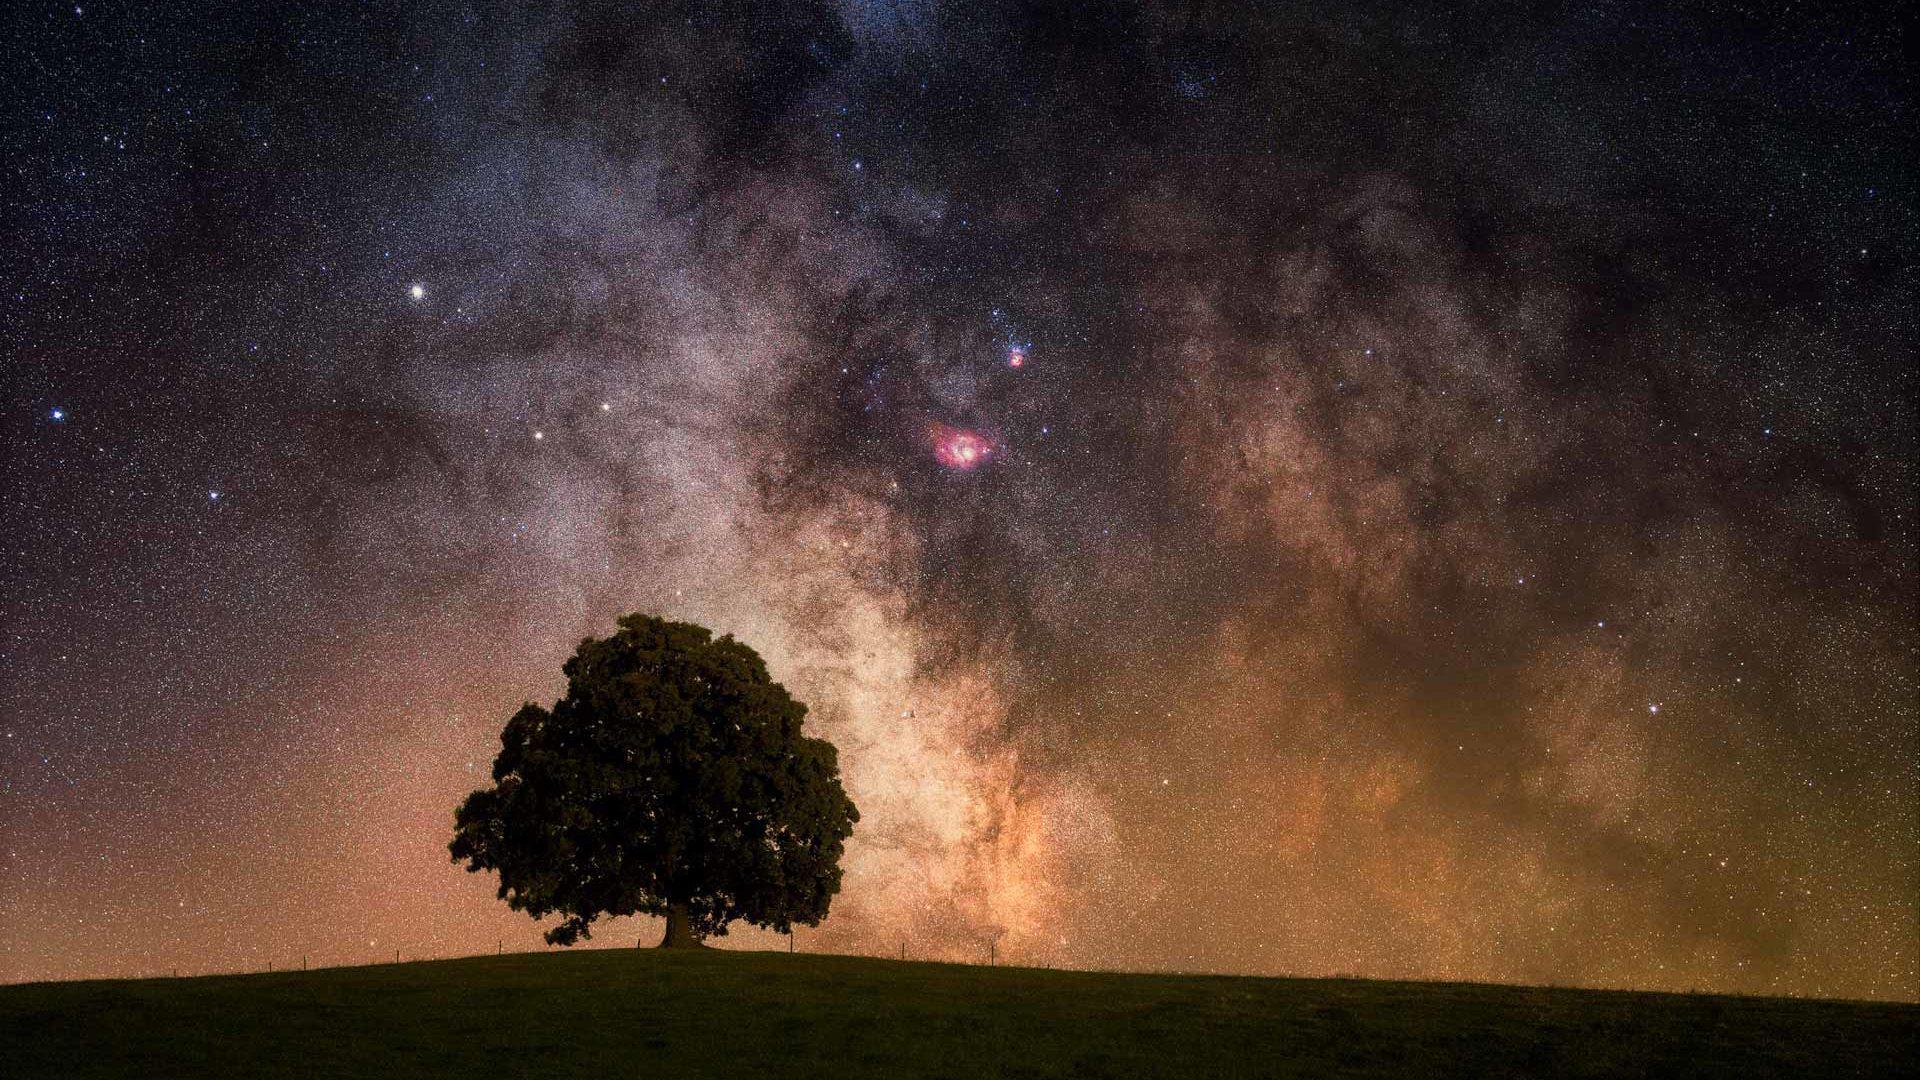 fotografie krajiny a astrofotografie